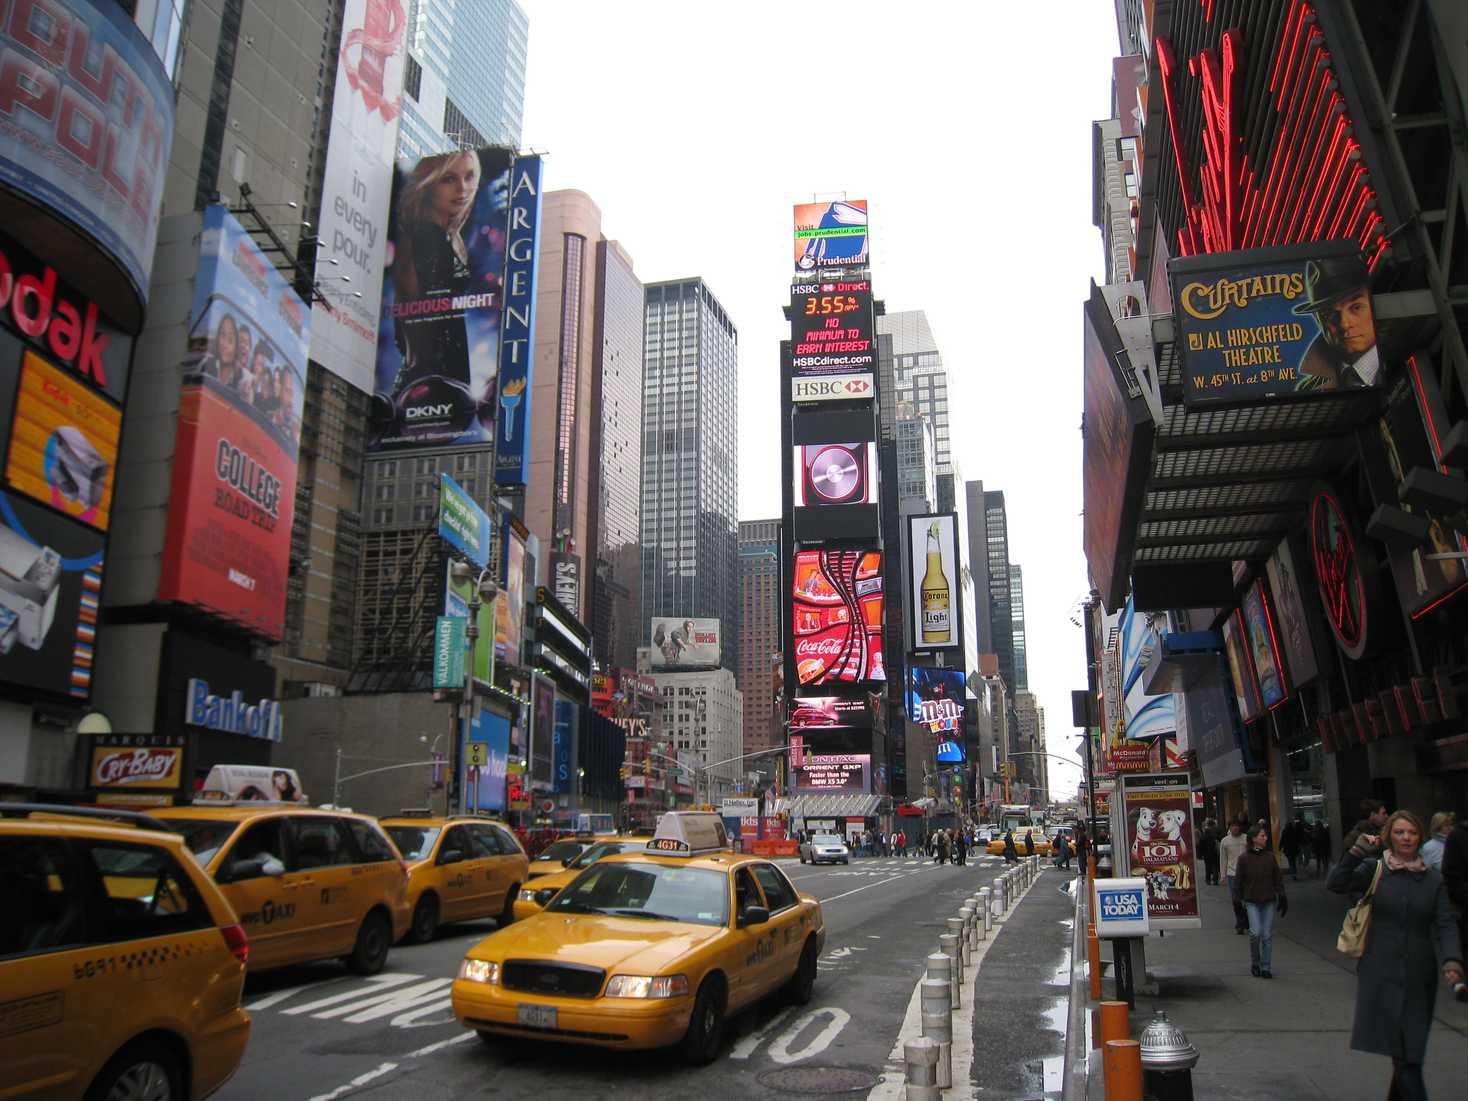 http://2.bp.blogspot.com/-H6hD9P3uacY/Ty8RF-4kTfI/AAAAAAAAAI8/nIRLQC9khGw/s1600/new-york-city.jpg